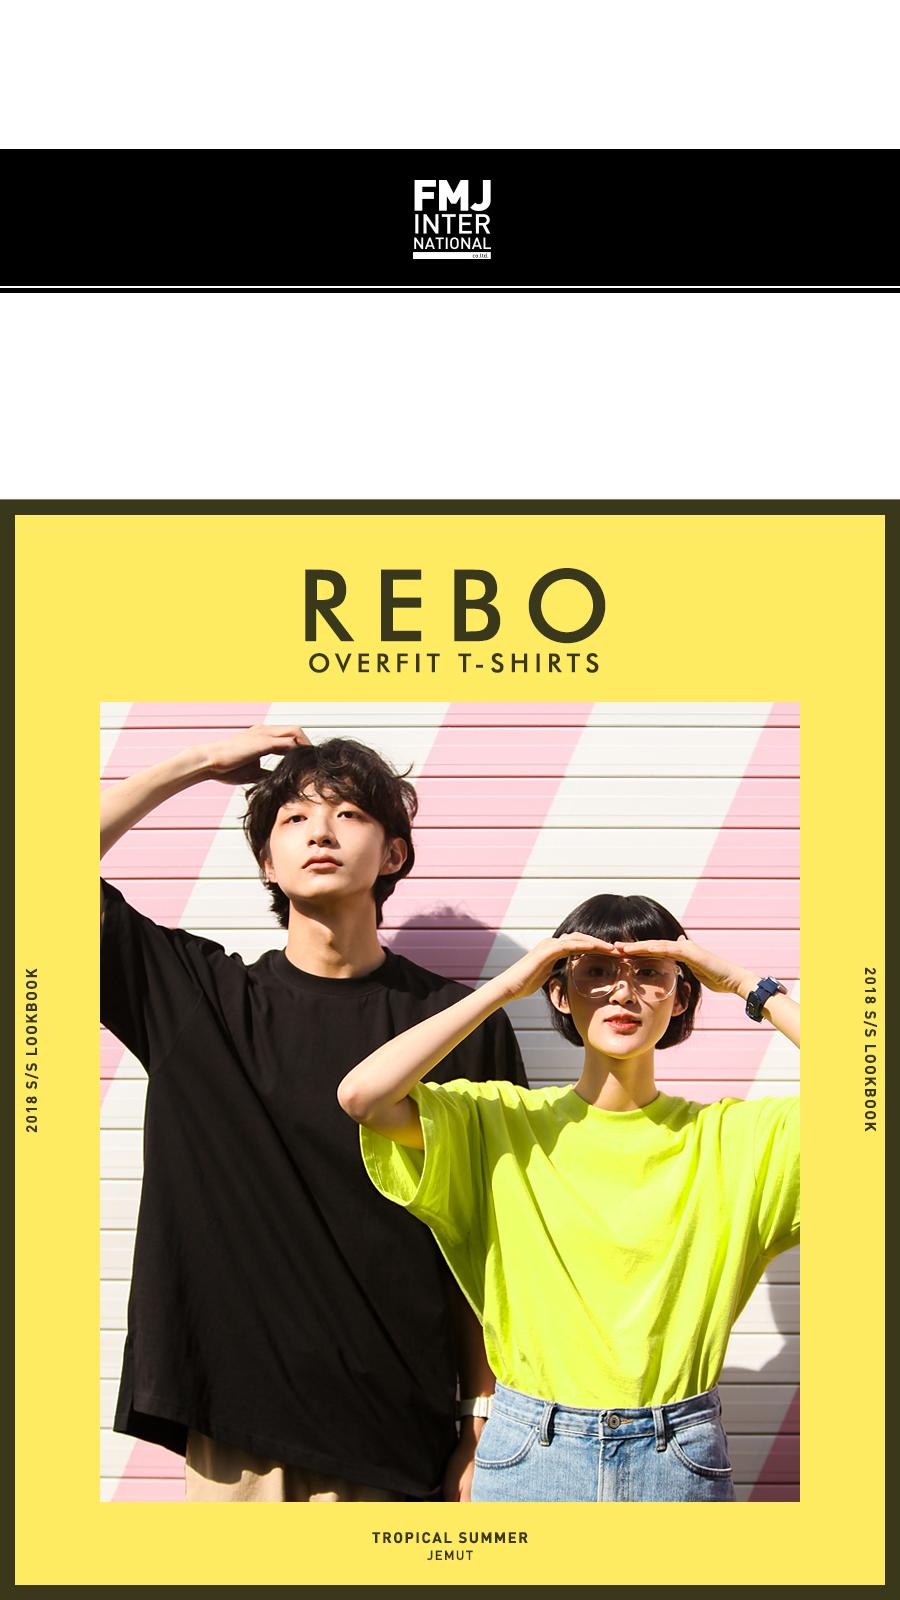 20180423_rebo_overfit_model_mj_01.jpg